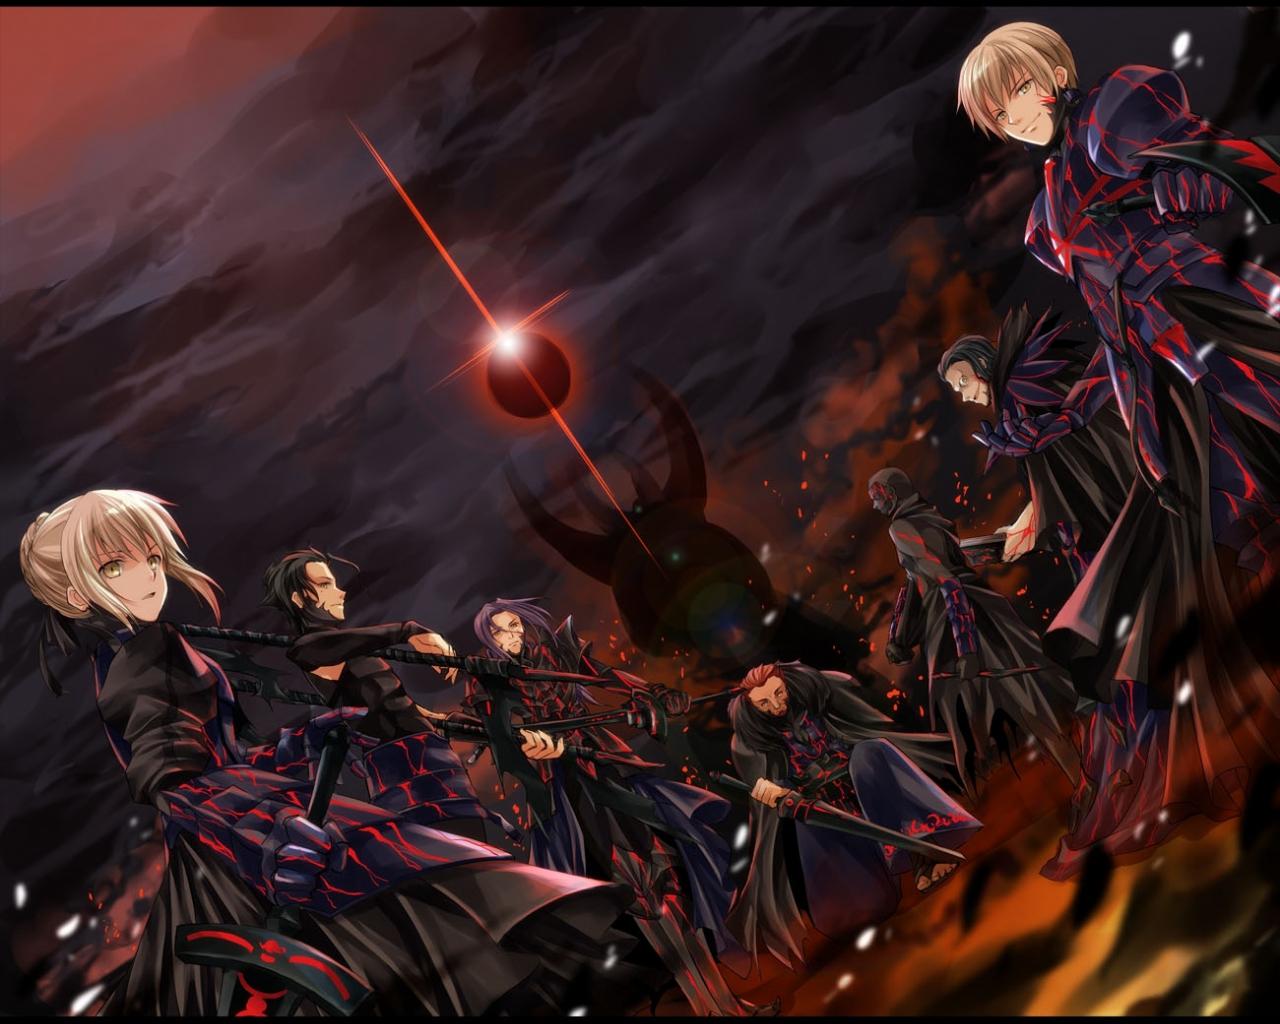 Free Download Fate Stay Night Fate Zero Gilgamesh Jpeg Artifacts